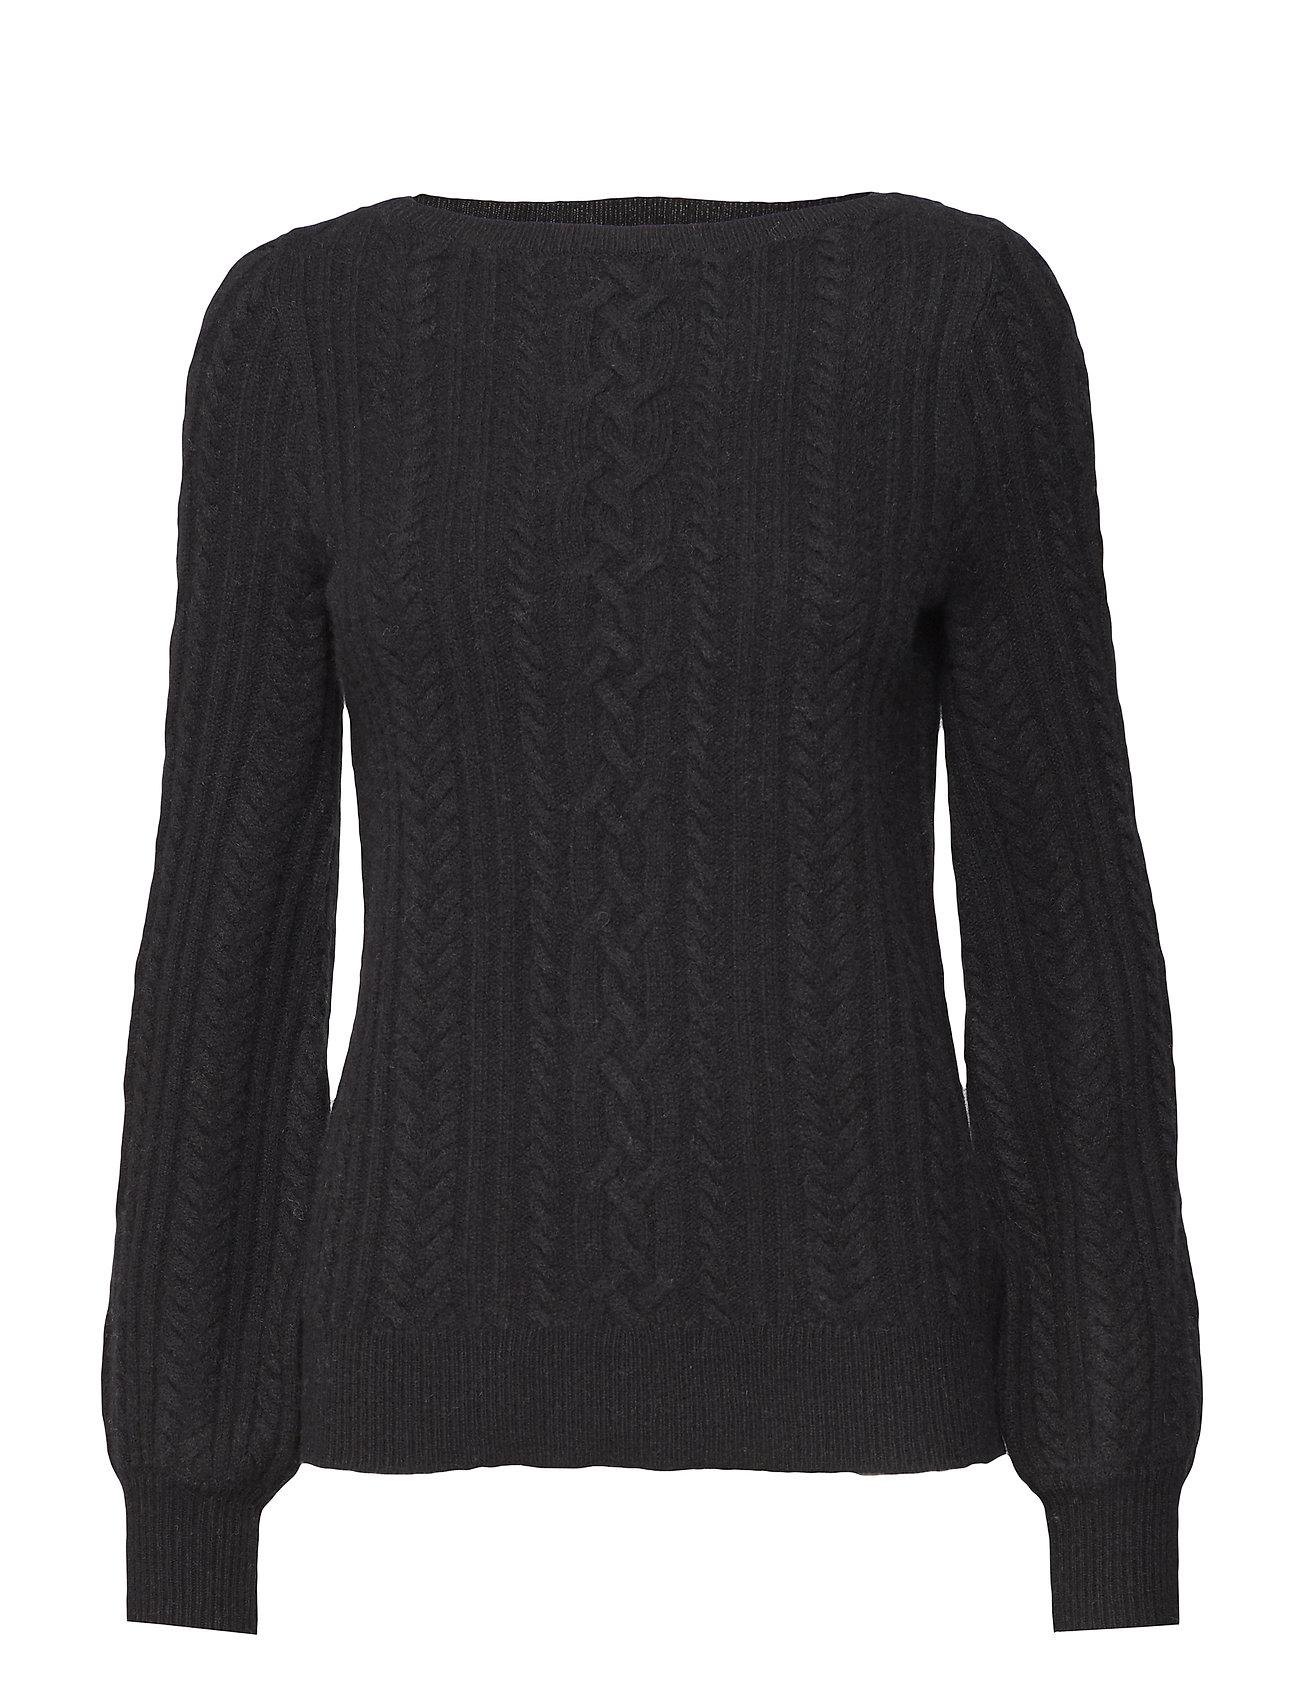 Lauren Ralph Lauren Cable Puff Sleeve Sweater Ögrönlar